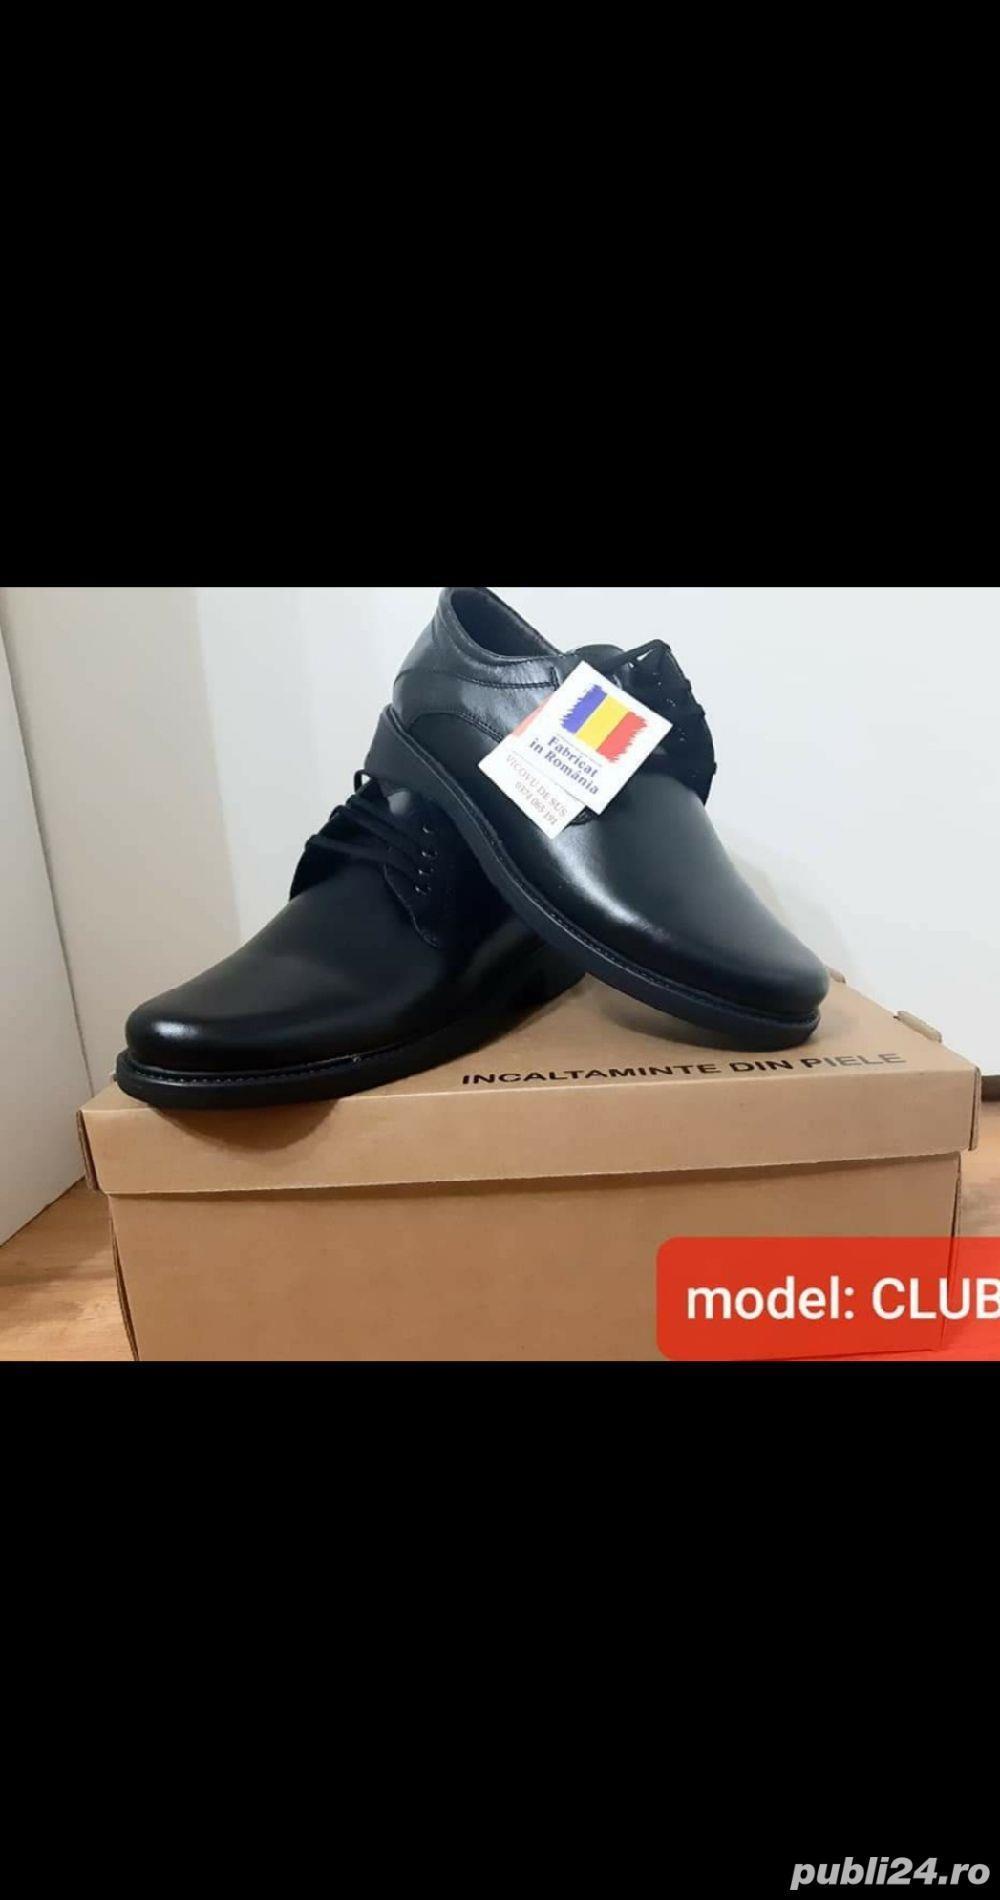 pantofi barbati model club negru piele naturala 100%